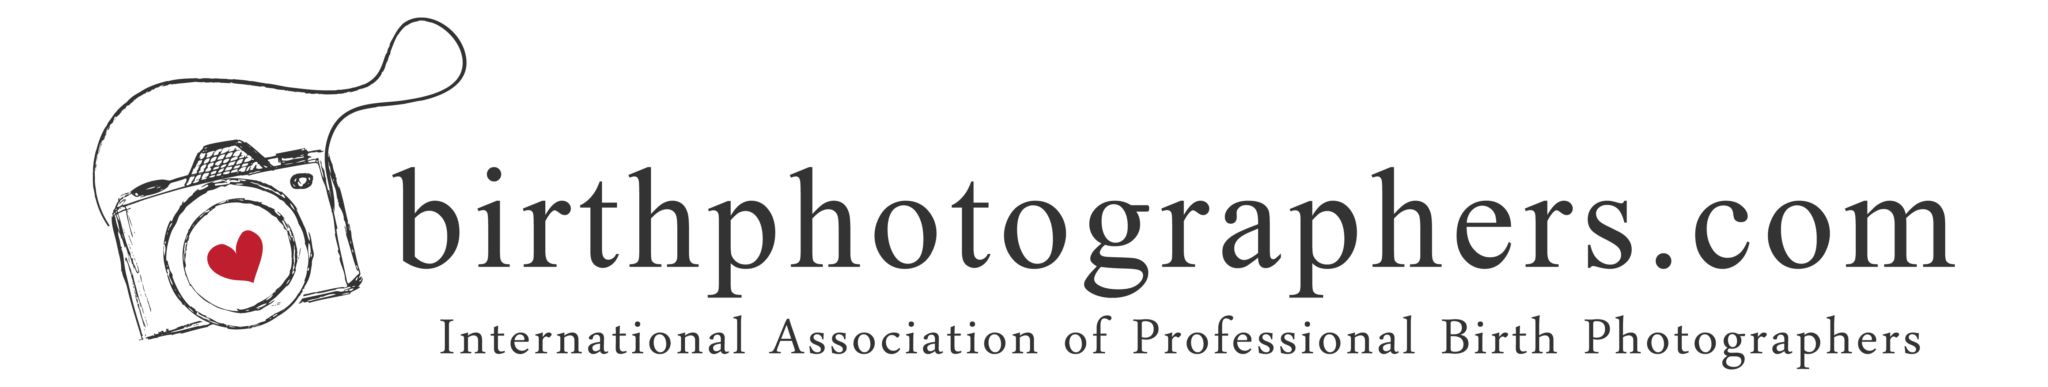 International Association of Professional Birth Photographers logo